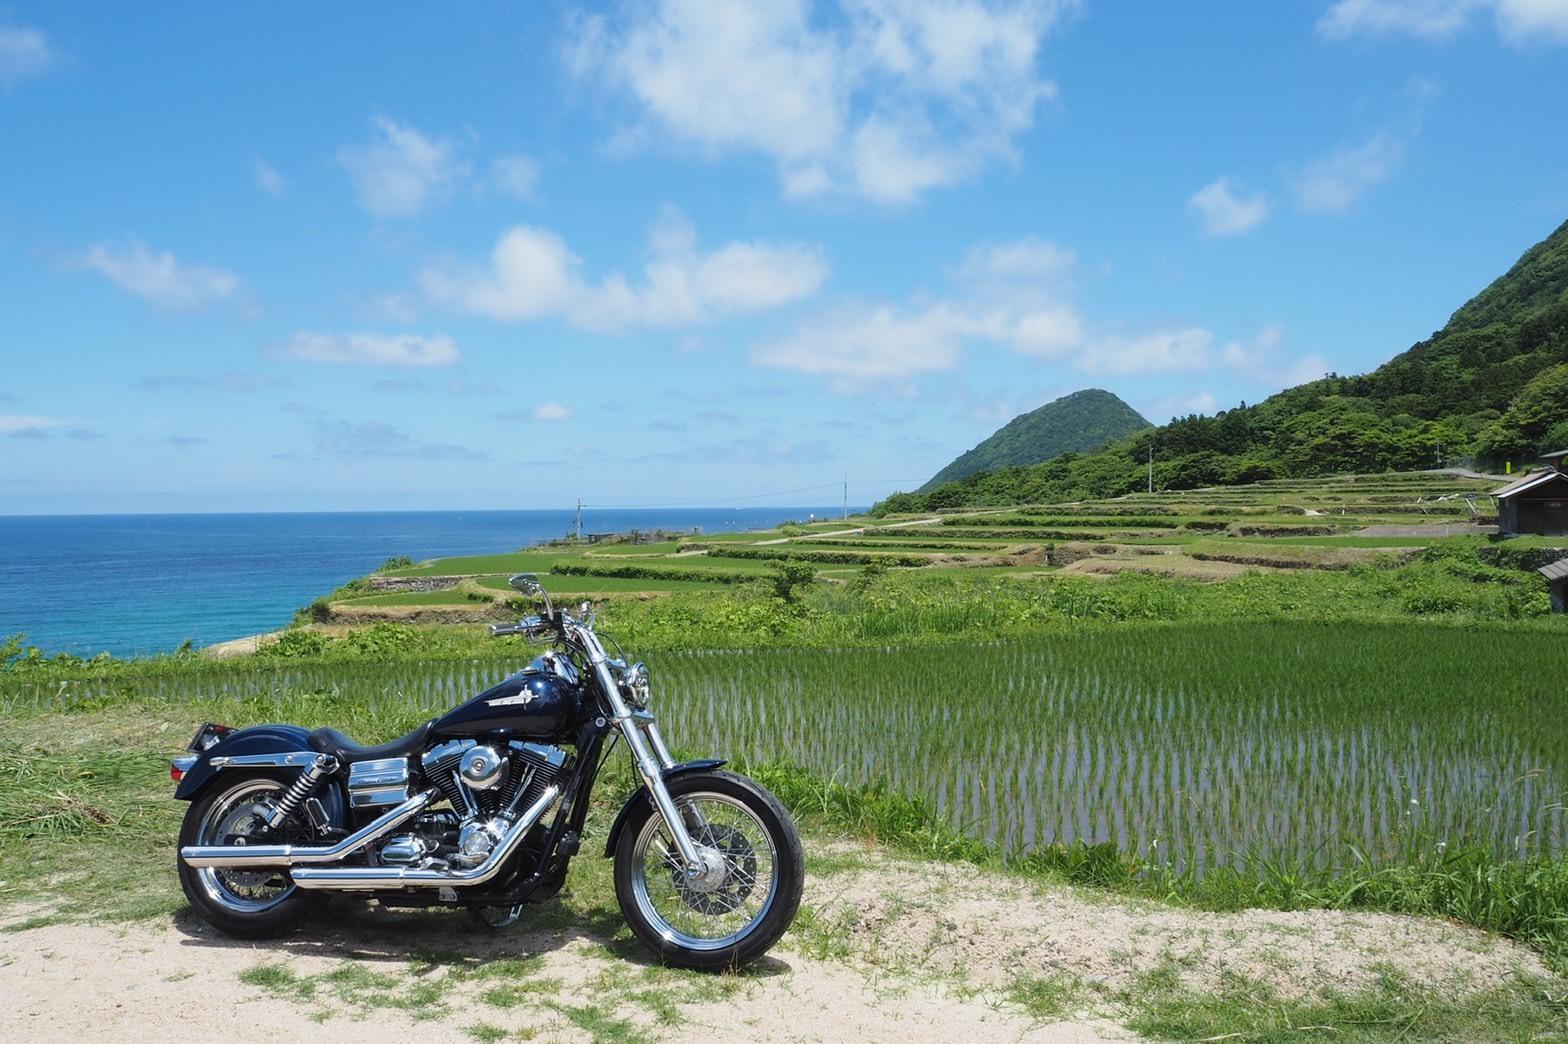 harleydavidson-motorcycle-touring-blog-kyoto-tanngopeninsula-riceterraces-of-sodeshi.jpg